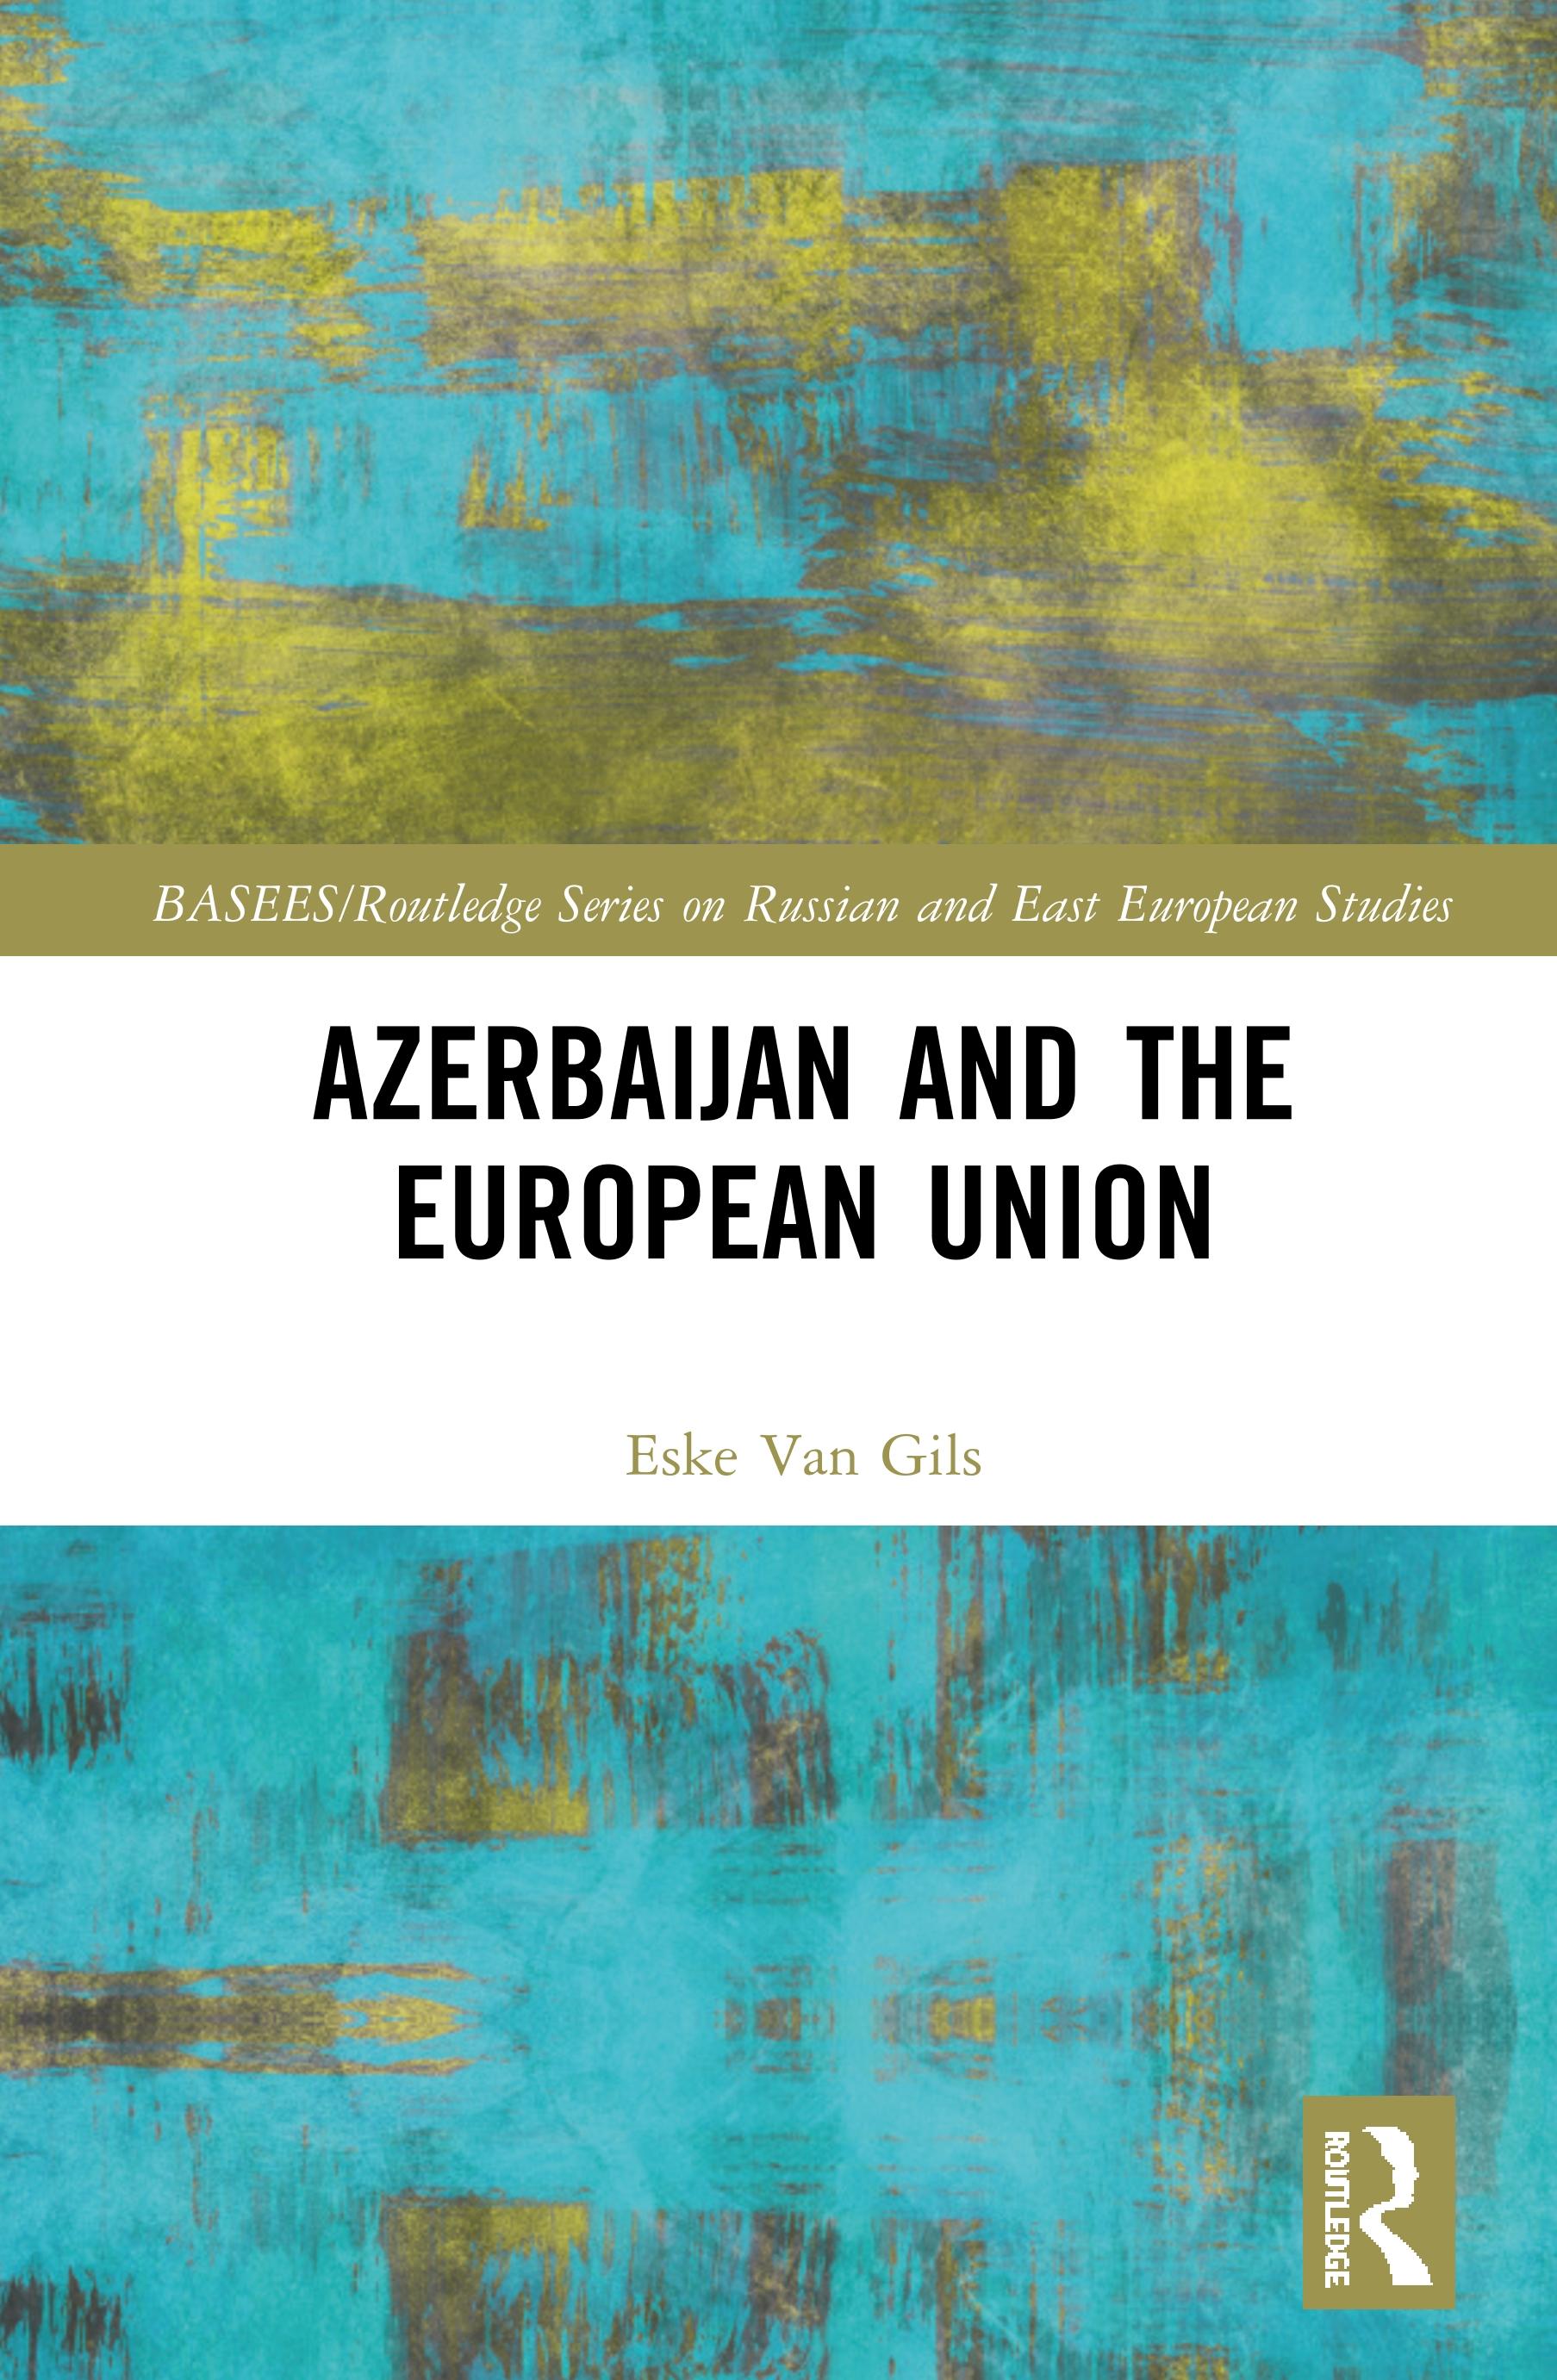 Azerbaijan and the European Union book cover